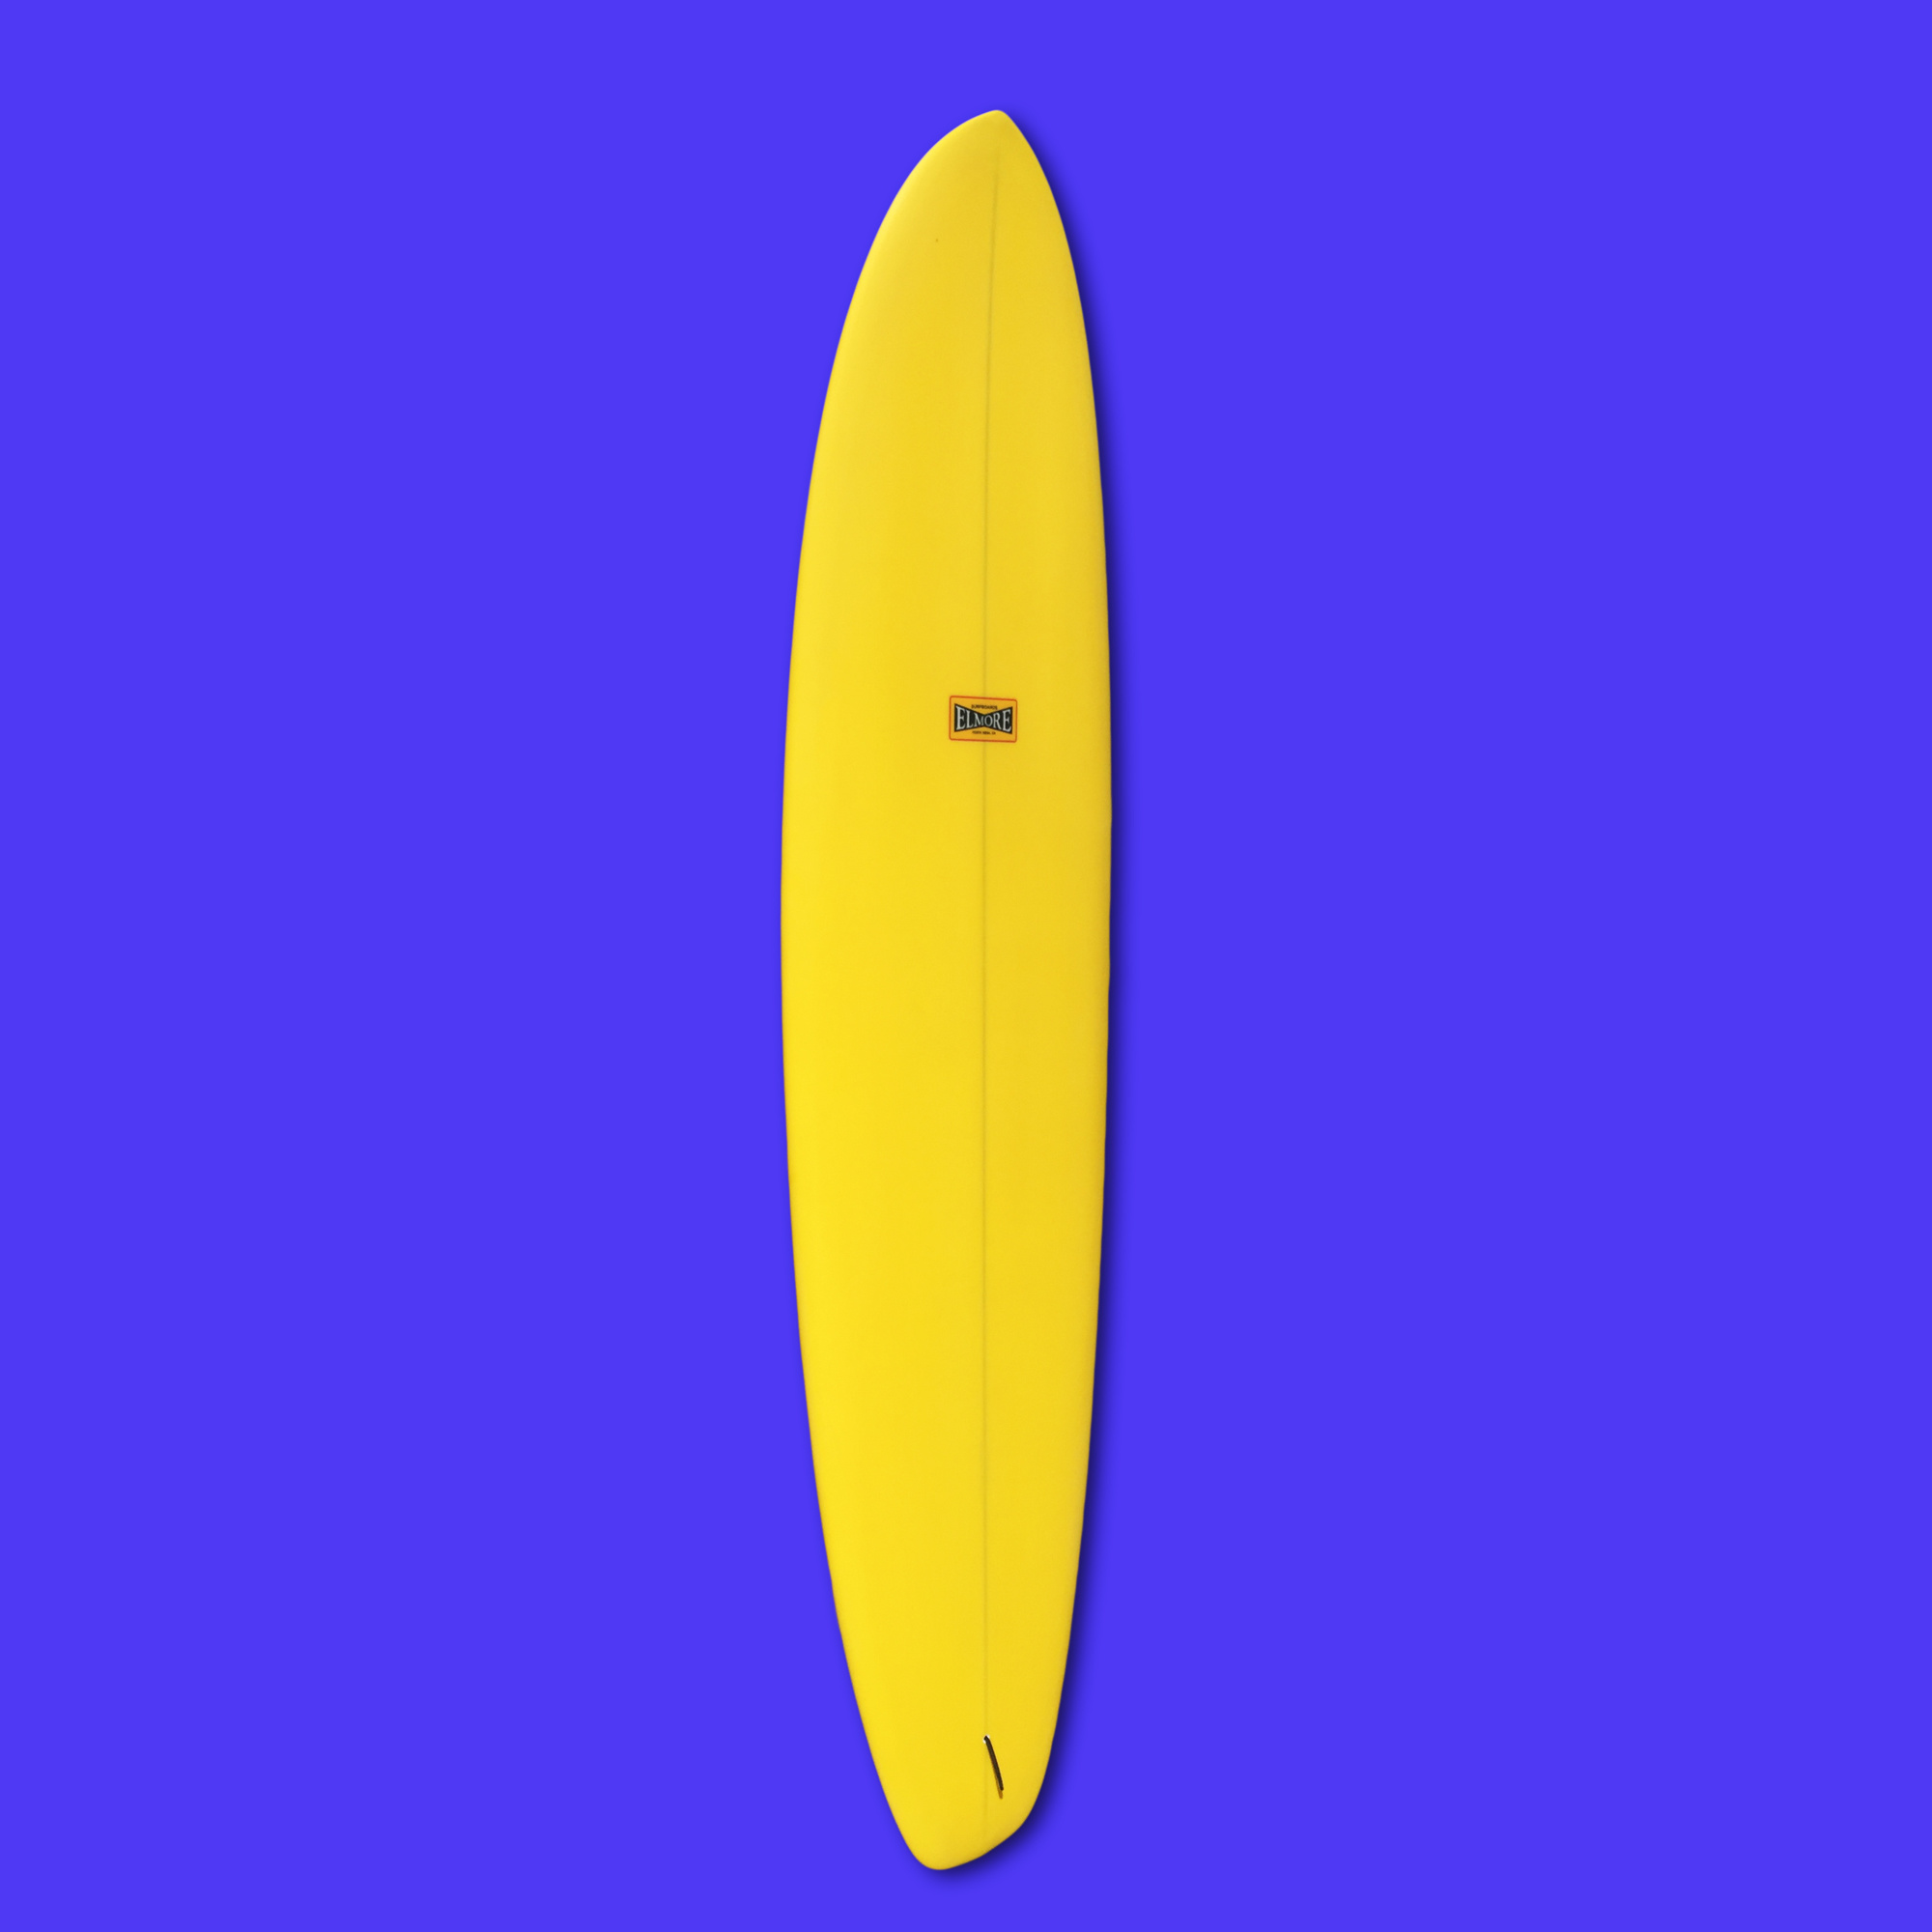 Troy Elmore Submarine 7'7